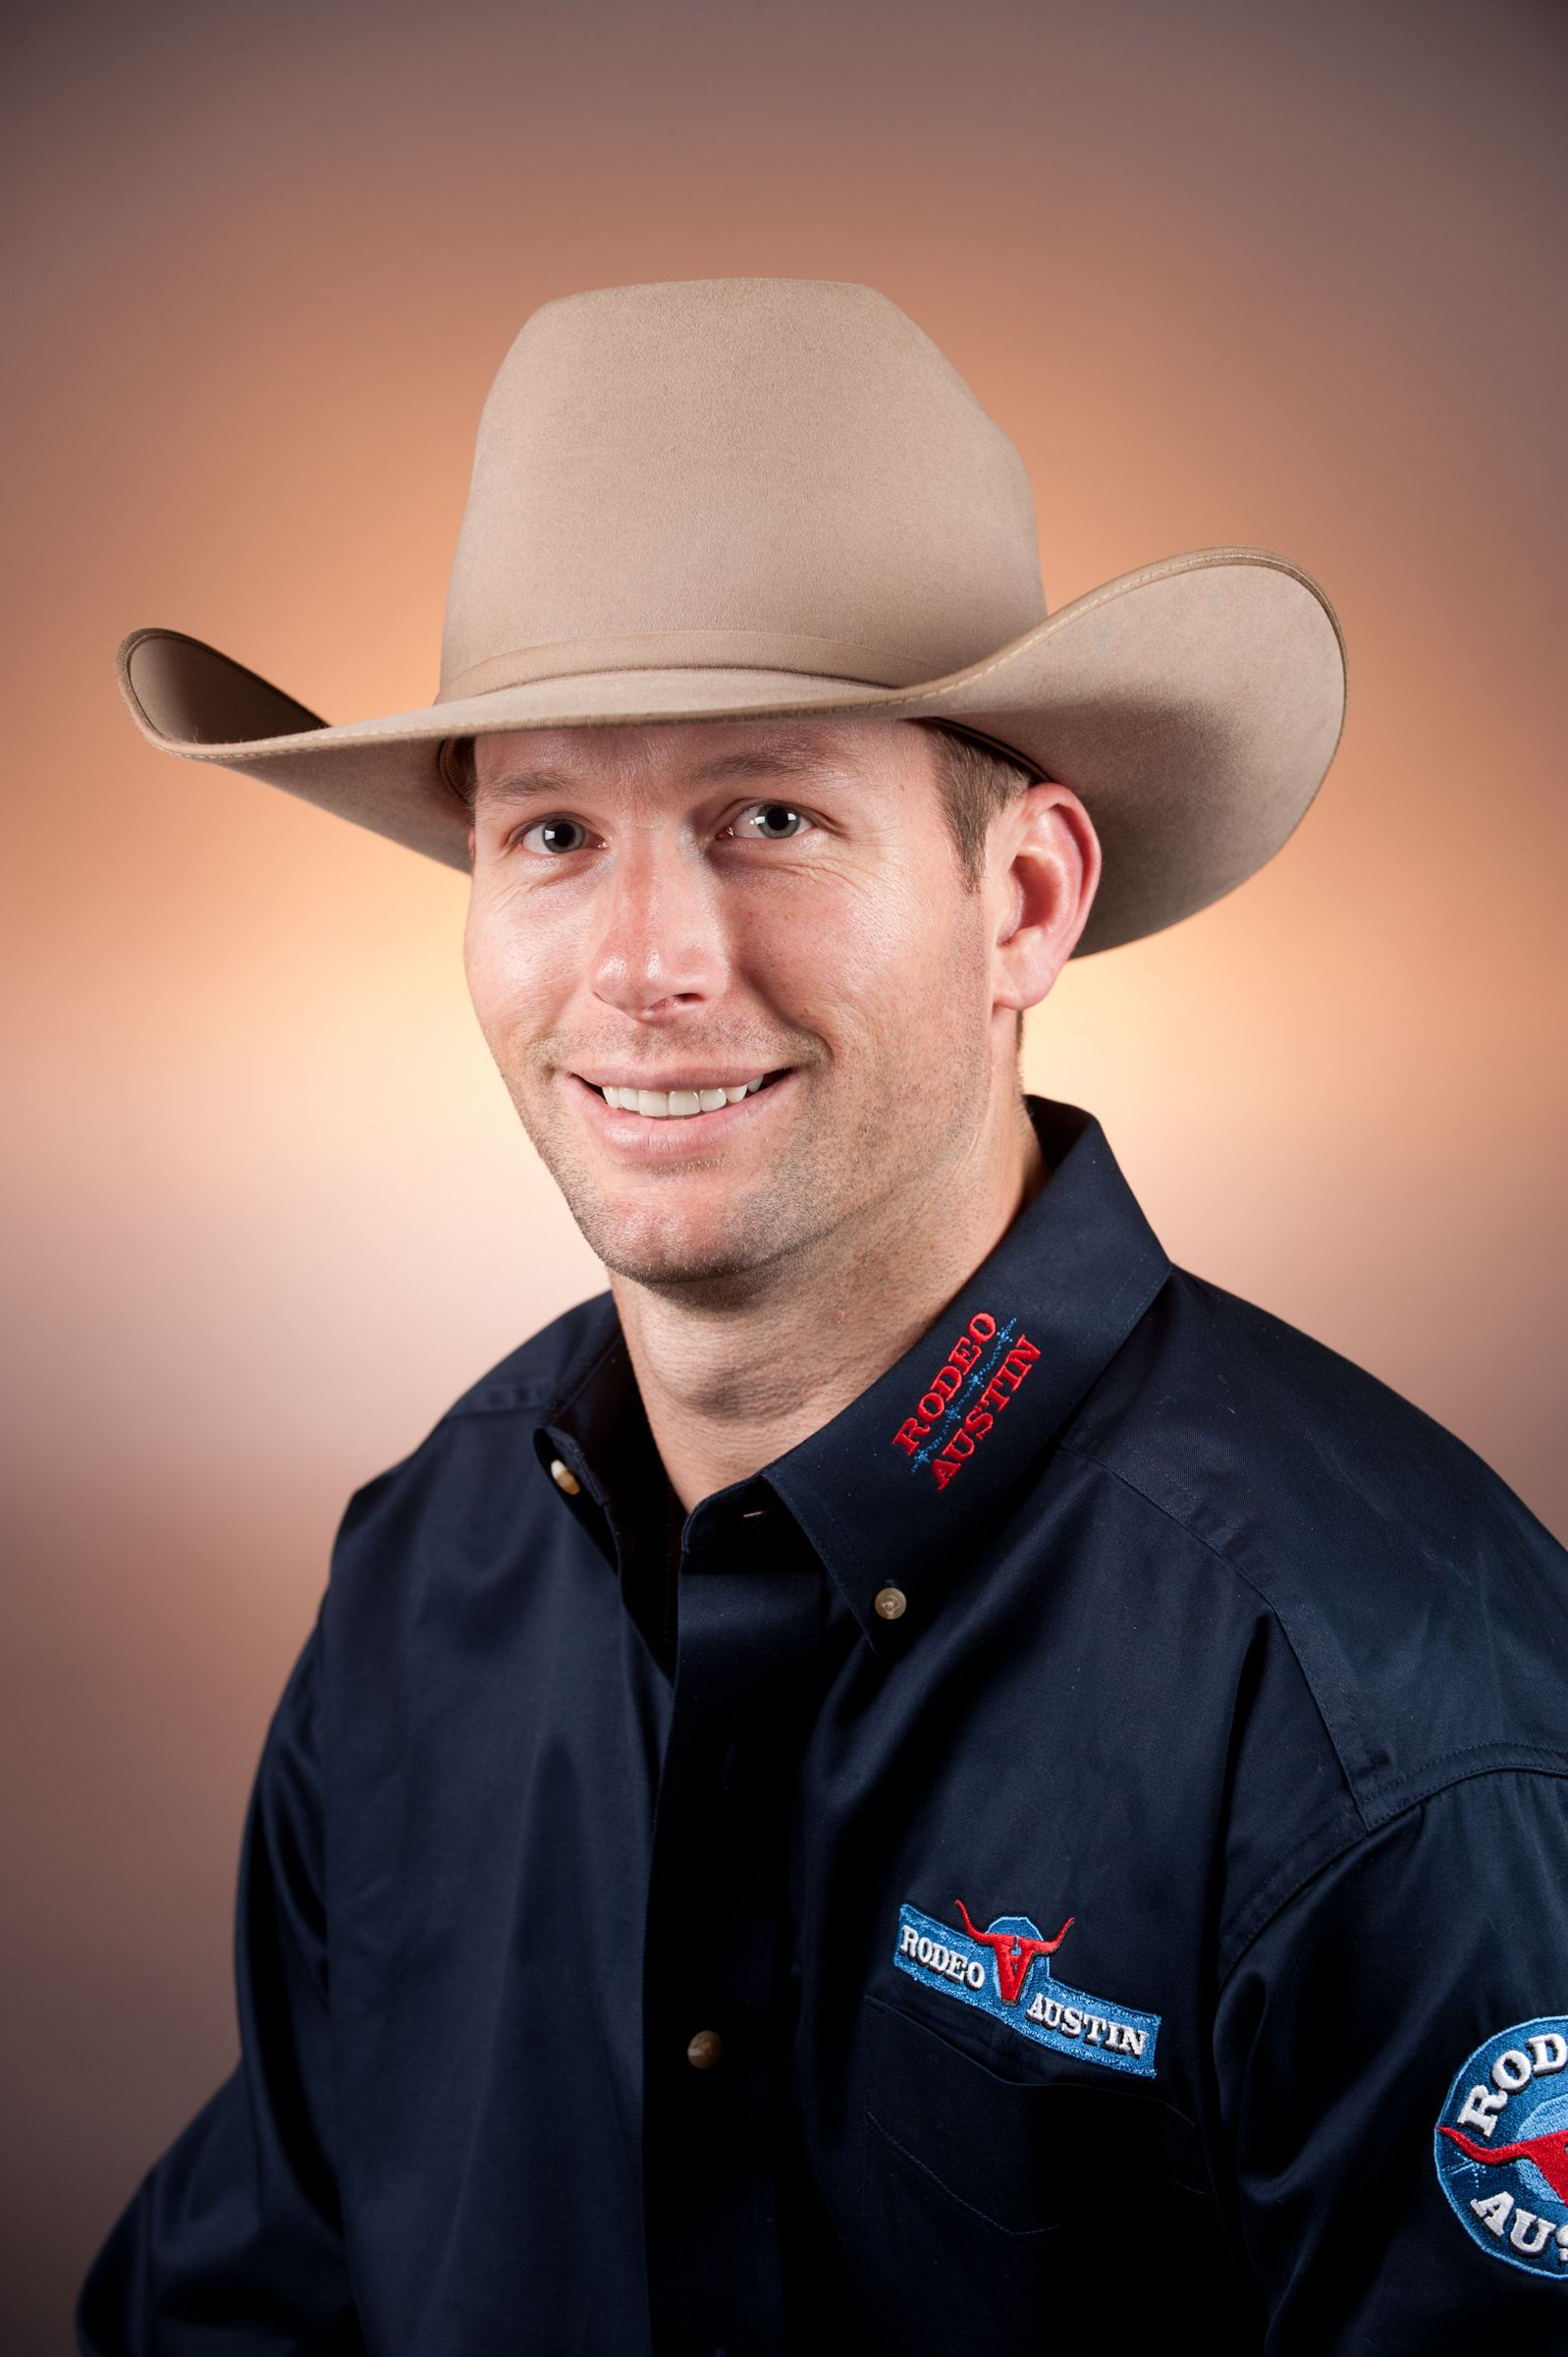 Redneck bareback riding